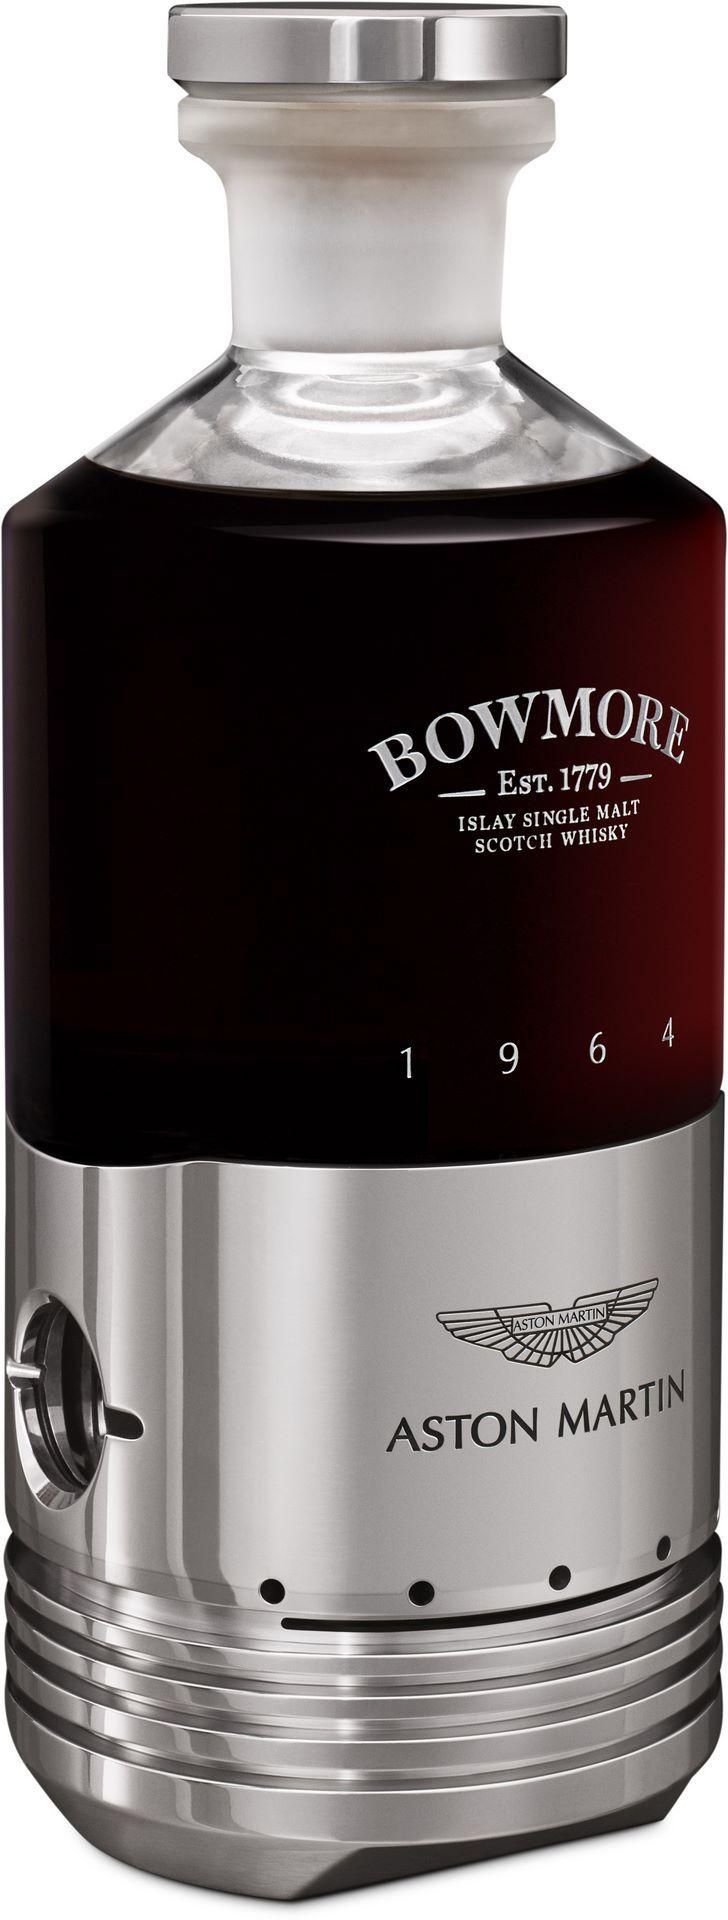 Black-Bowmore-Aston-Martin-DB5-1964-Whisky-8